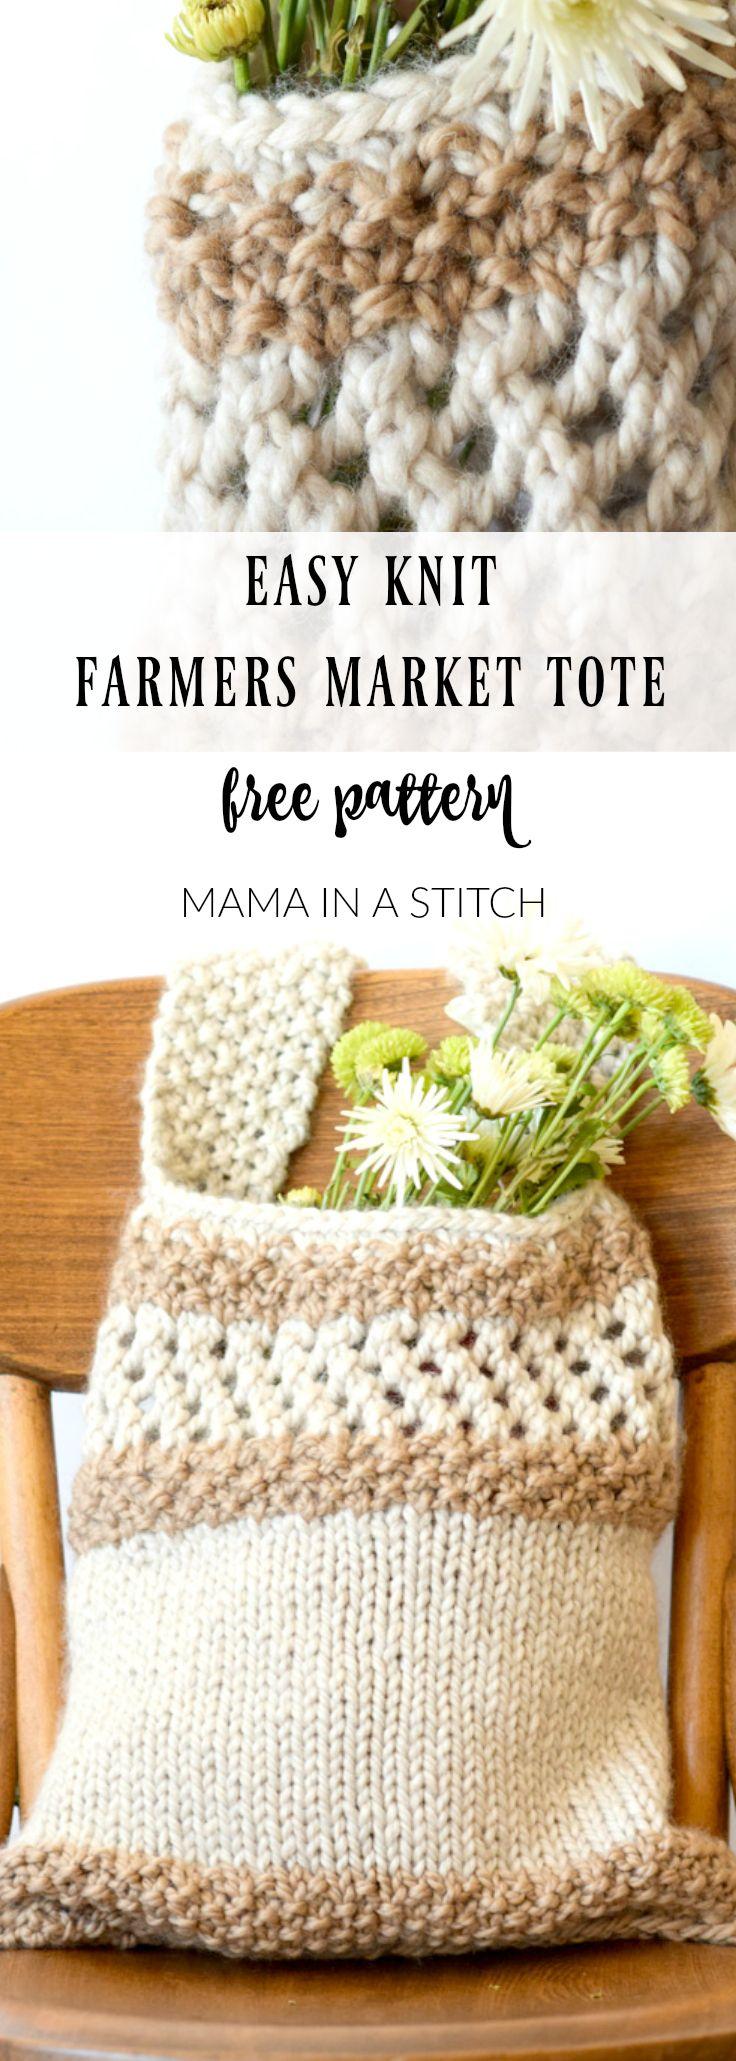 Knitting Stitch Patterns For Chunky Yarn : Best pretty knitting patterns images on pinterest